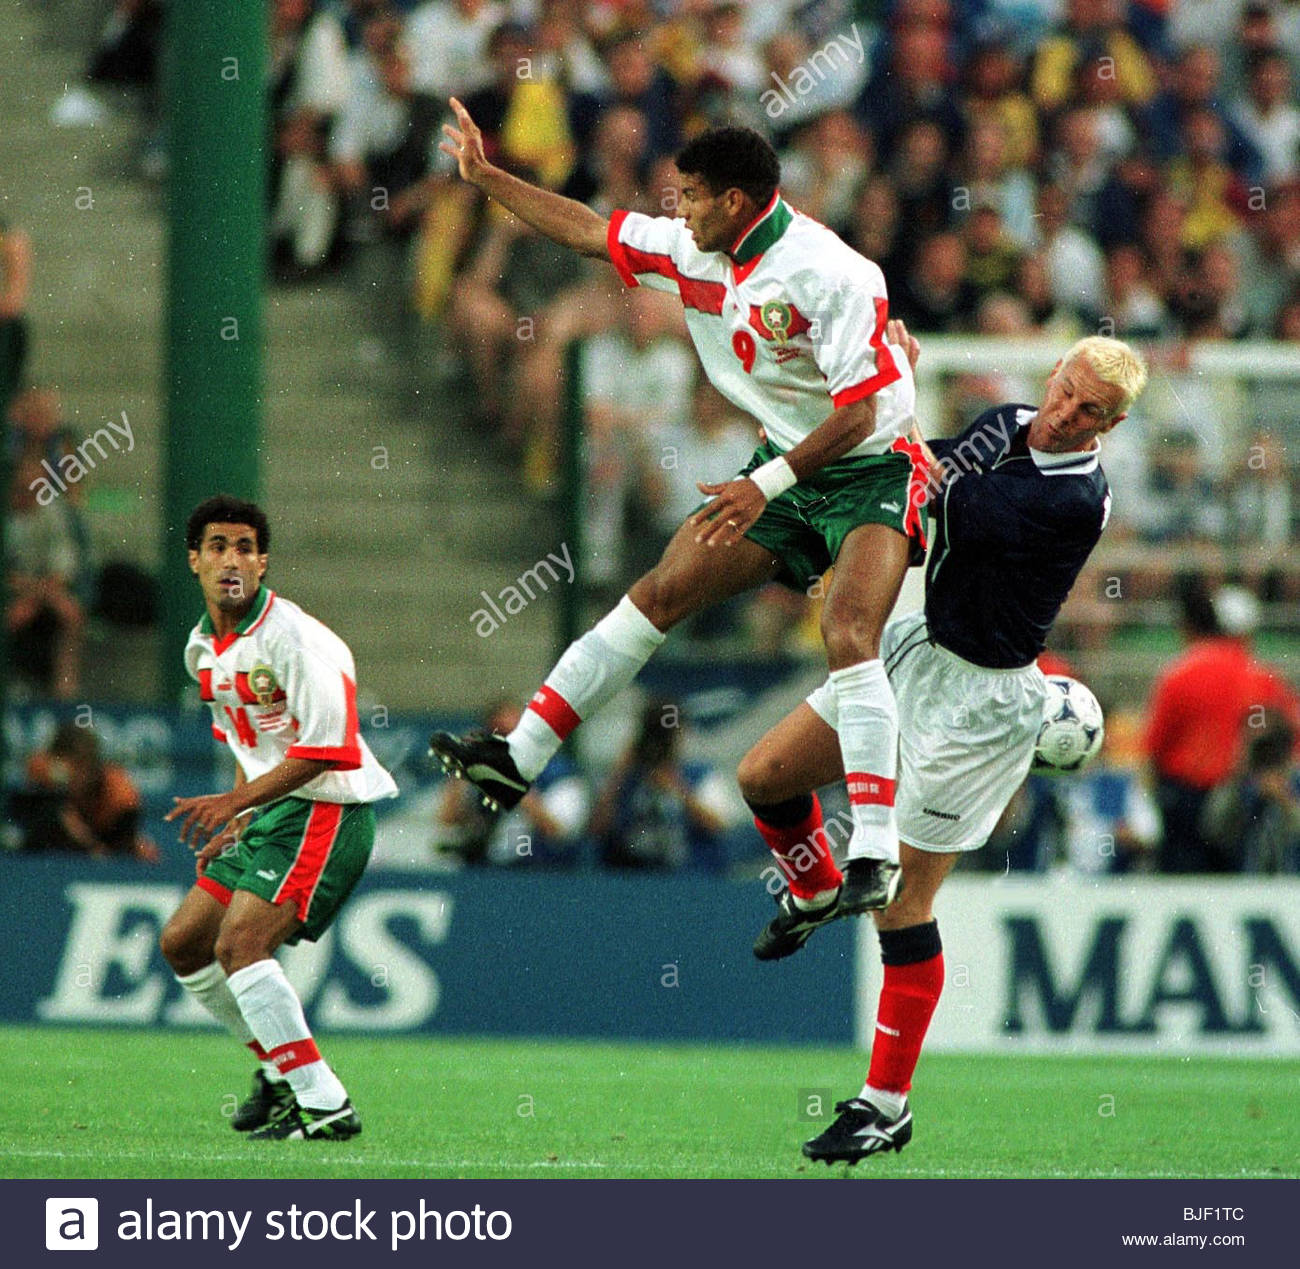 230698 fifa world cup 1998 morocco v scotland 30